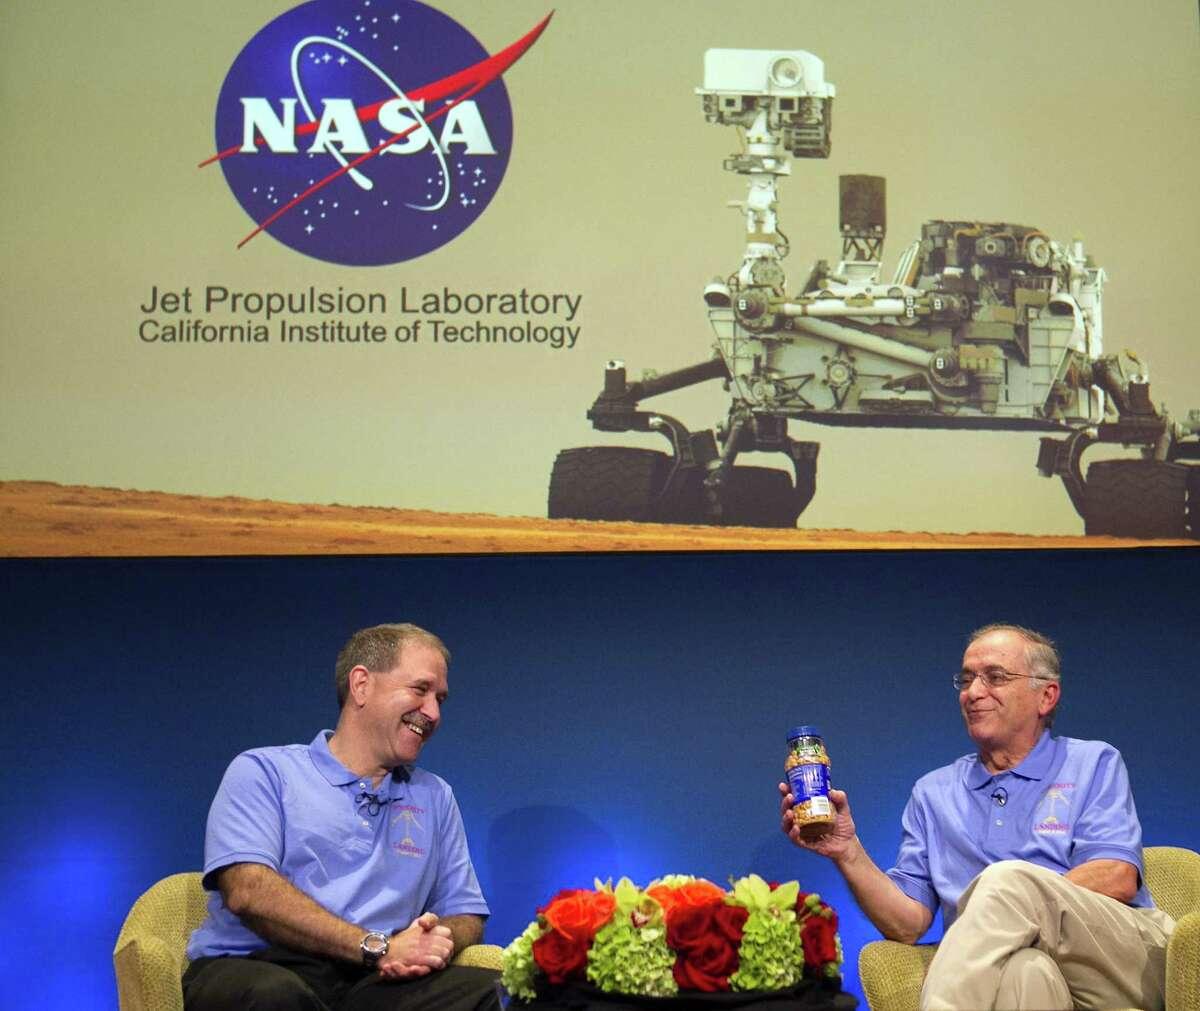 John Grunsfeld, NASA Associate Administrator, NASA Headquarters, left, and Charles Elachi, JPL Director, NASA Jet Propulsion Laboratory, present a can of